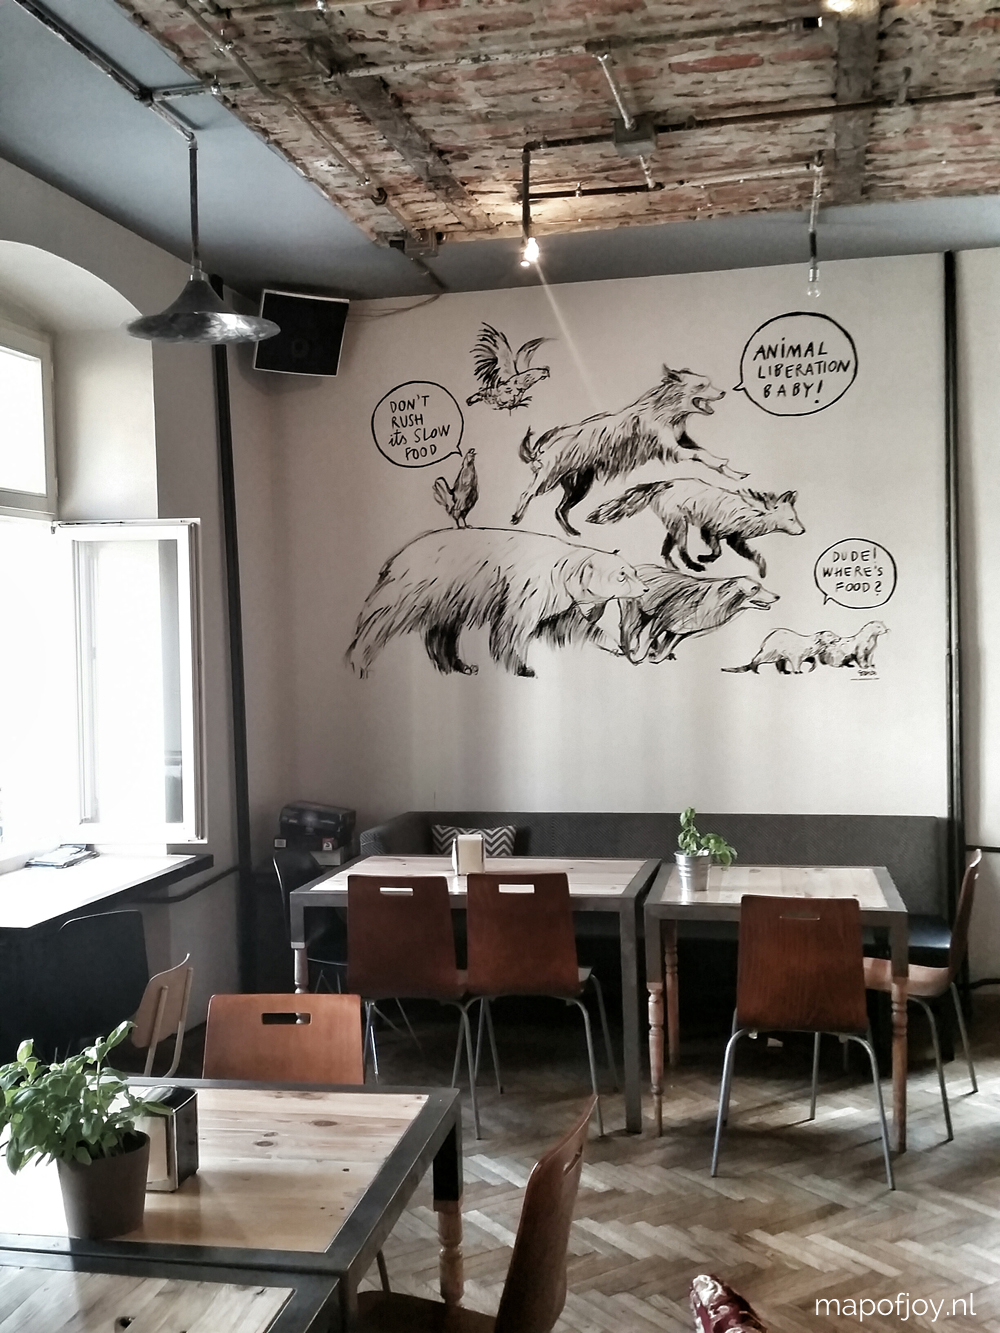 8x food hotspot Vega in Wroclaw, Poland - Map of Joy